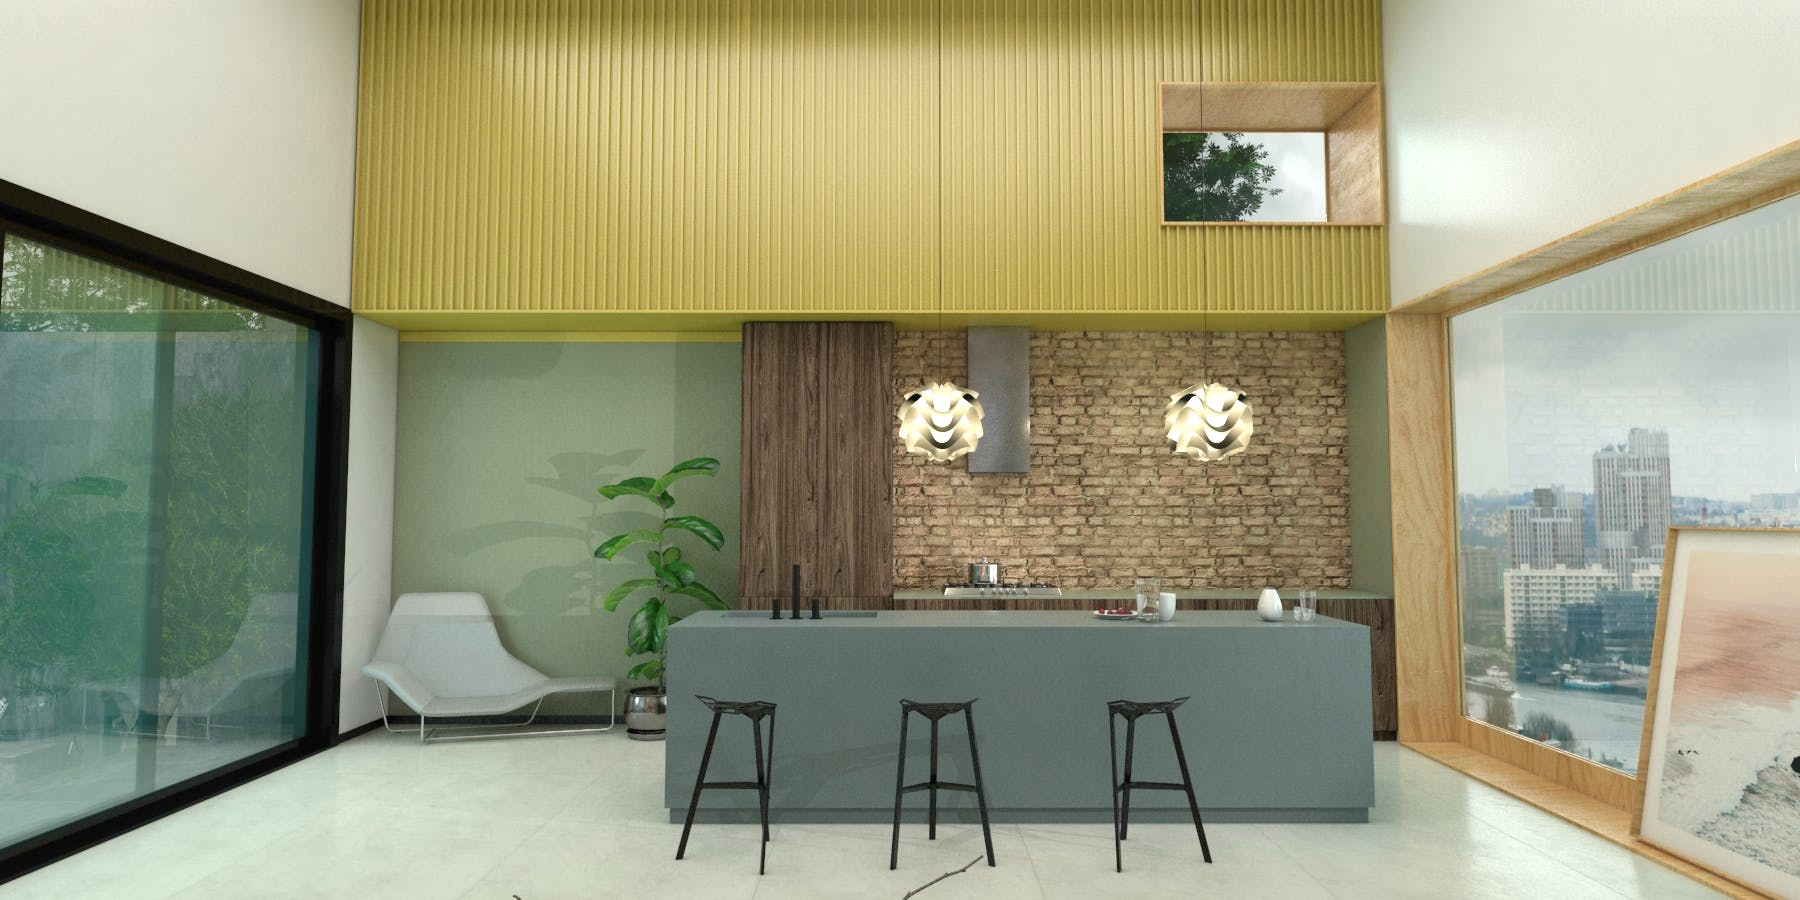 Image of Virtual stand Cosentino KBIS 2021 Kitchen 7 in Cosentino at KBIS 2021 - Cosentino